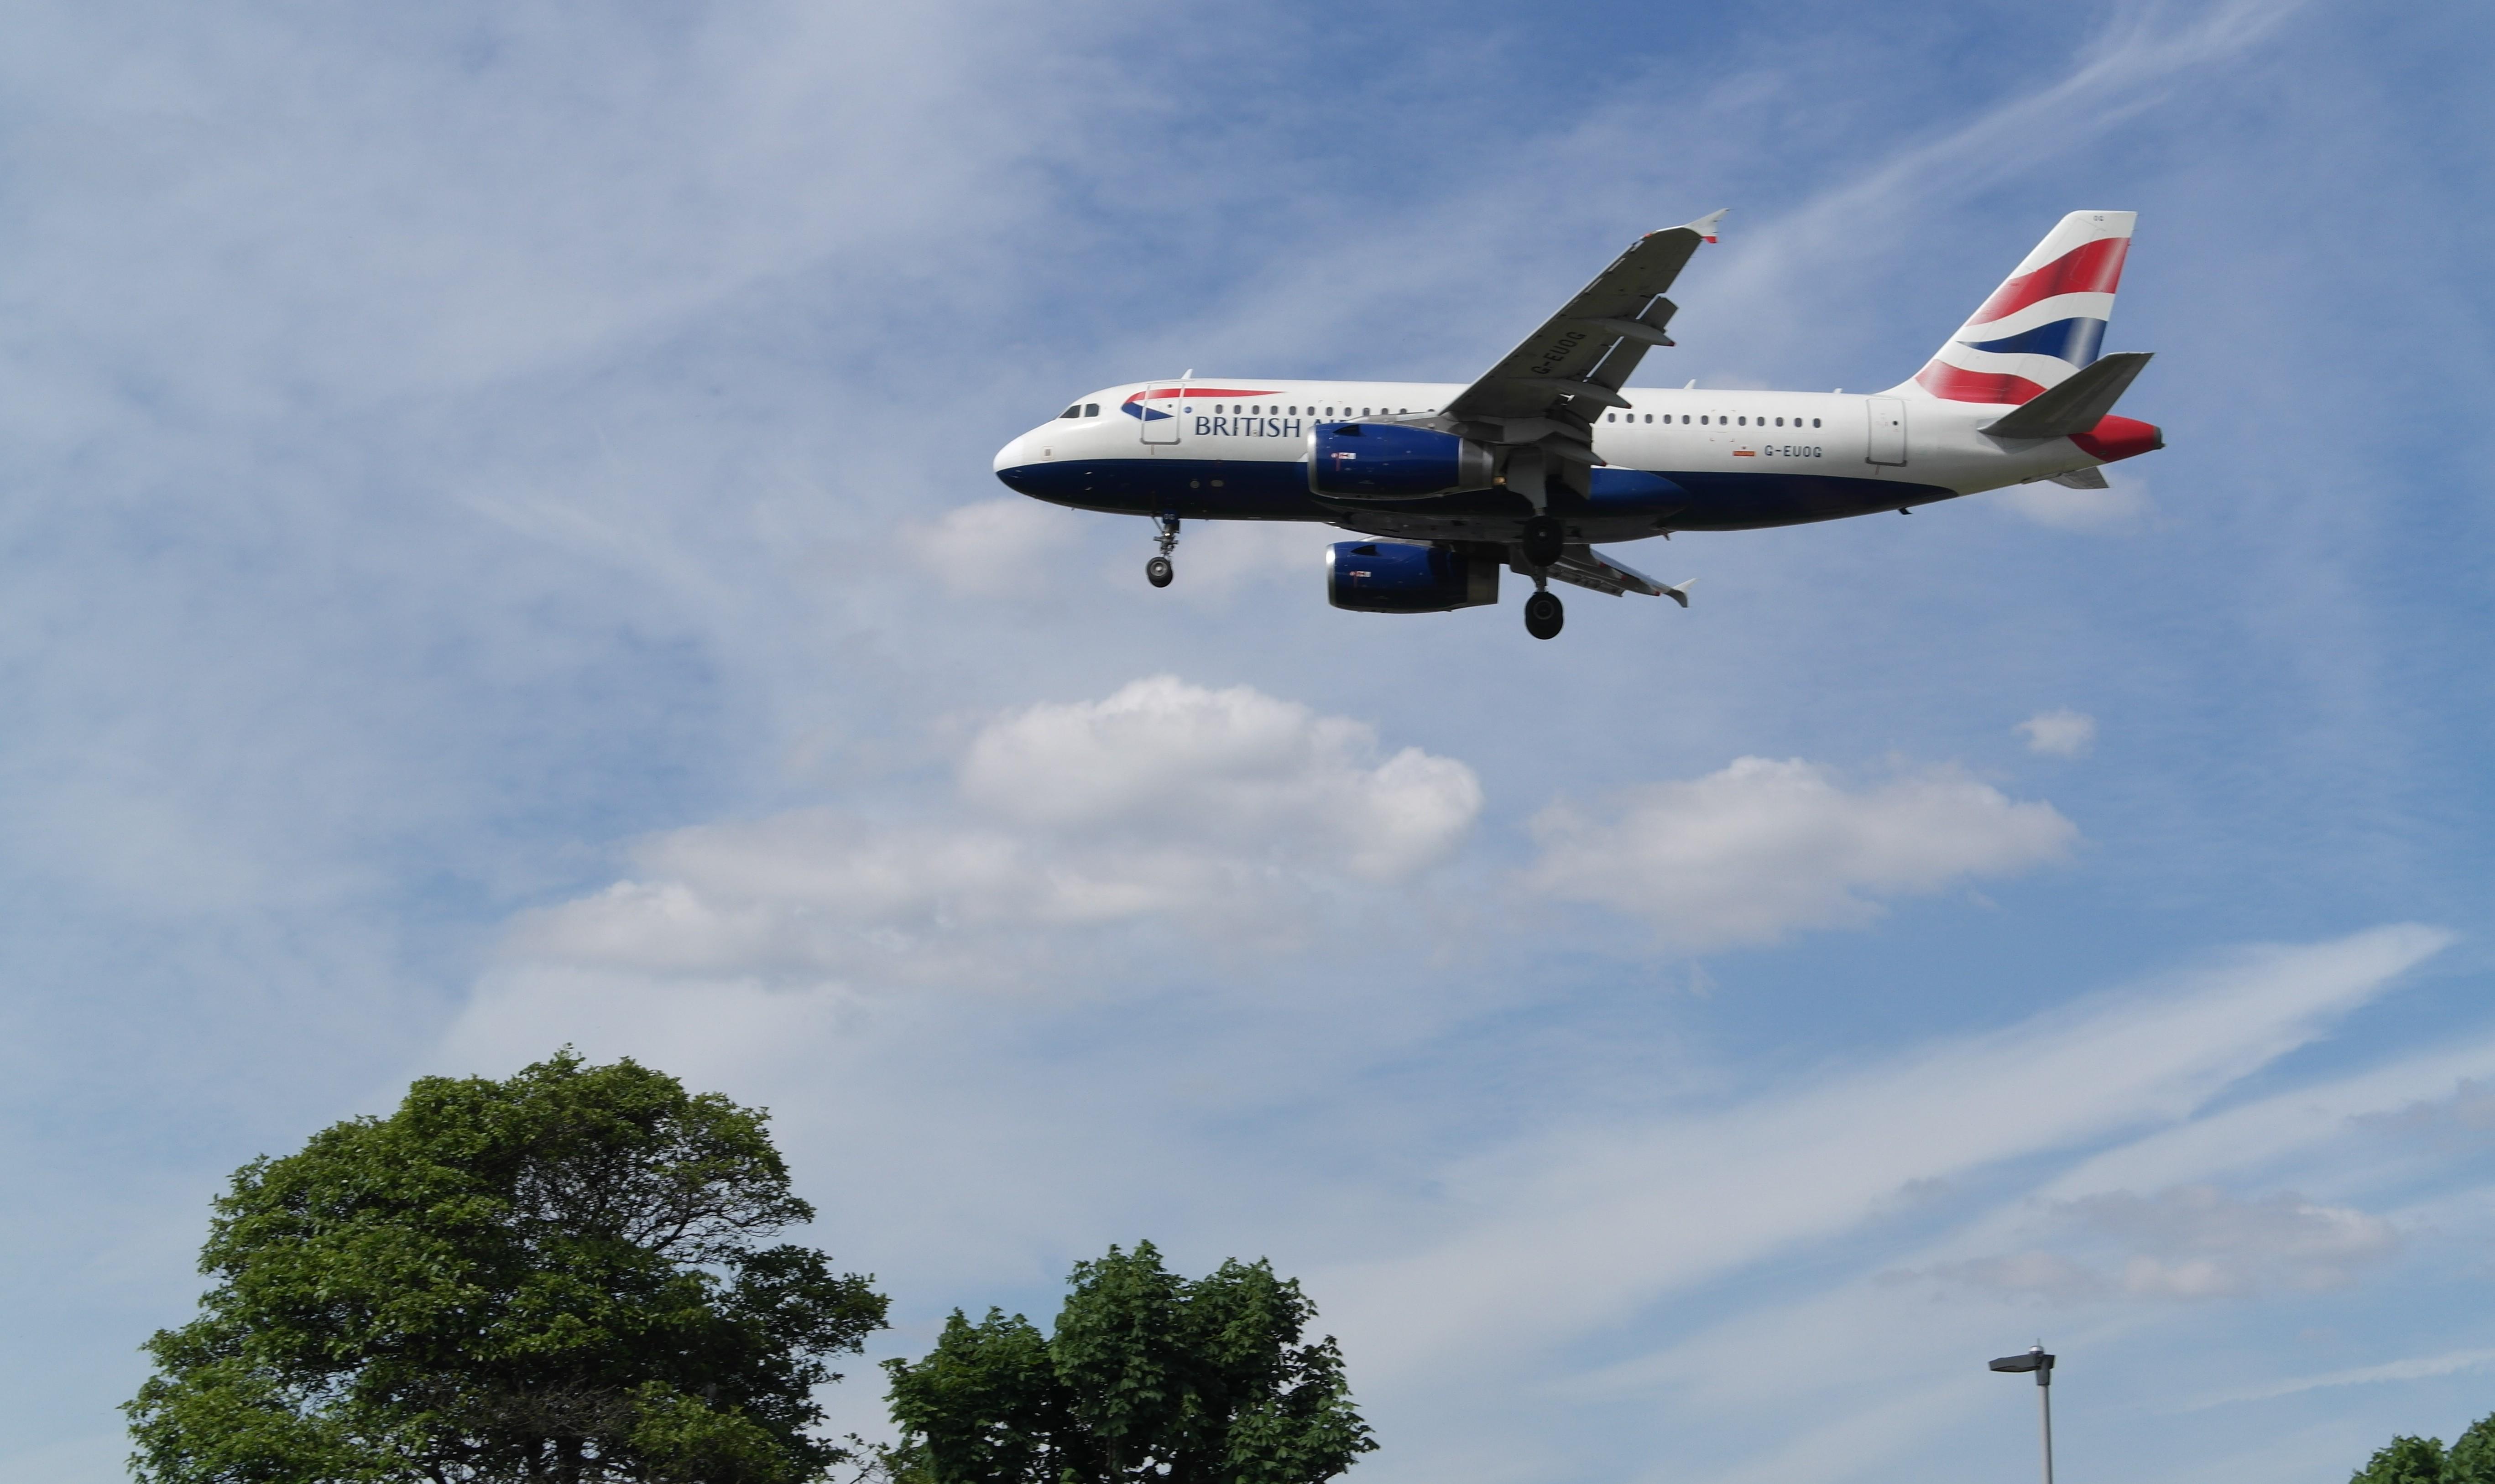 Myrtel Ave – Planespotting Heathrow Airport Panorama